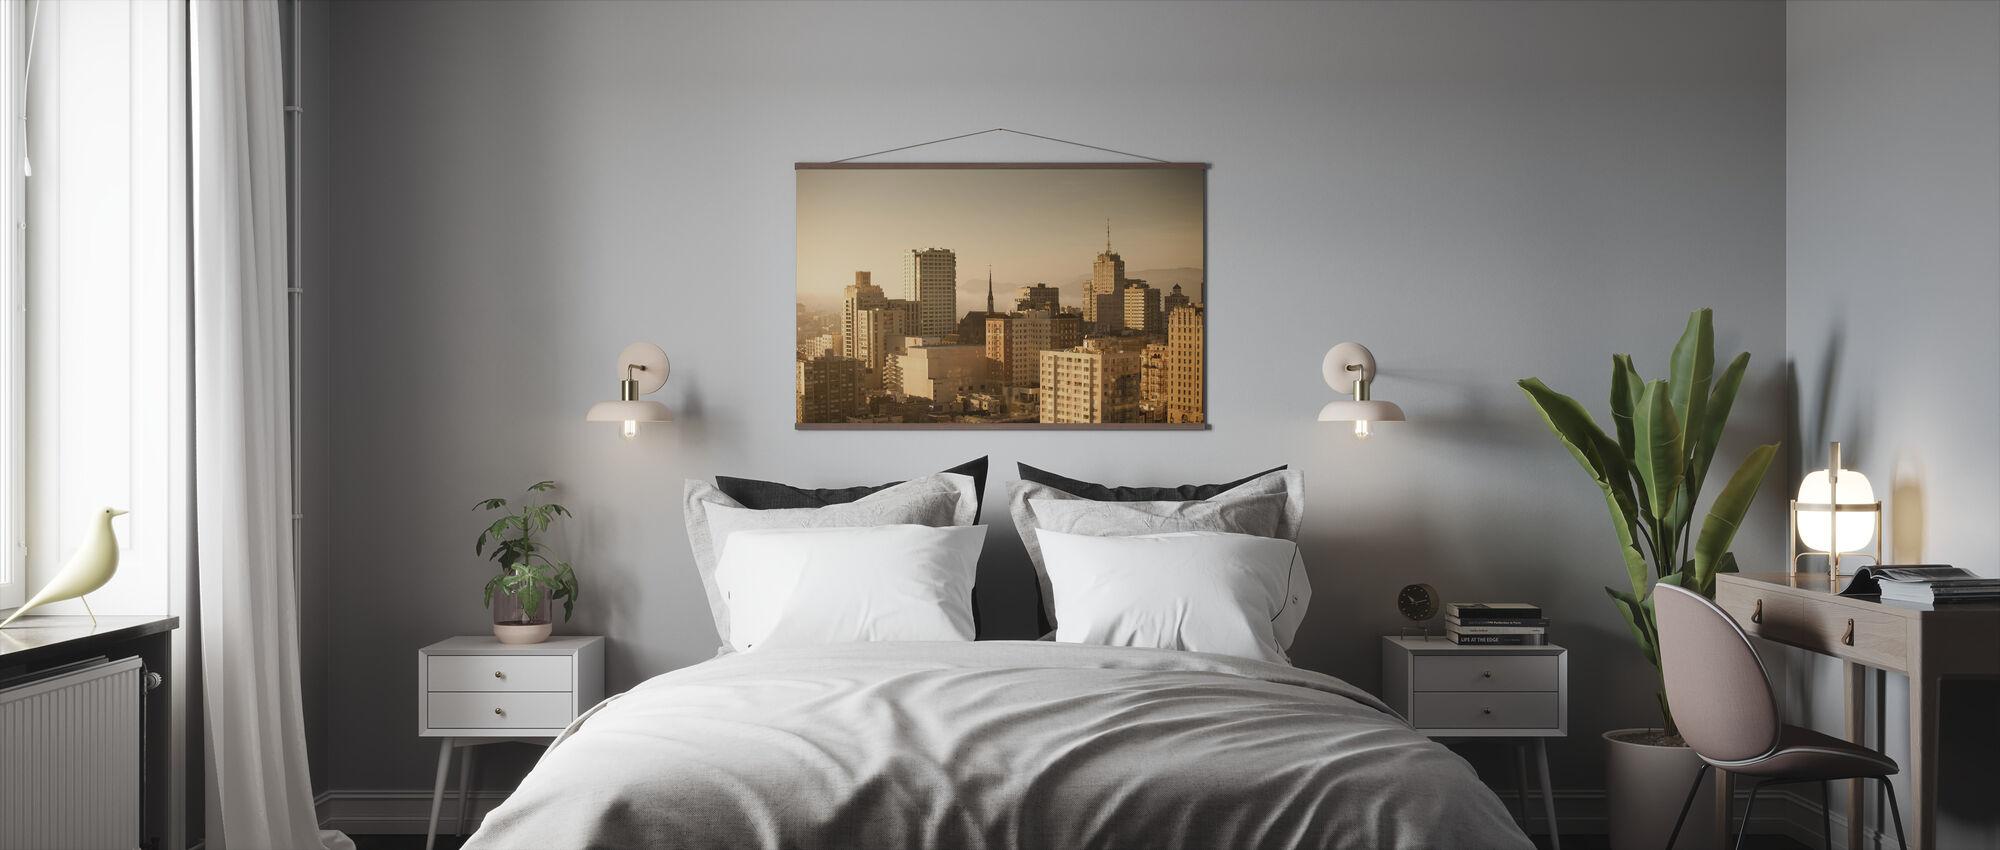 Sprankelende San Francisco - Poster - Slaapkamer